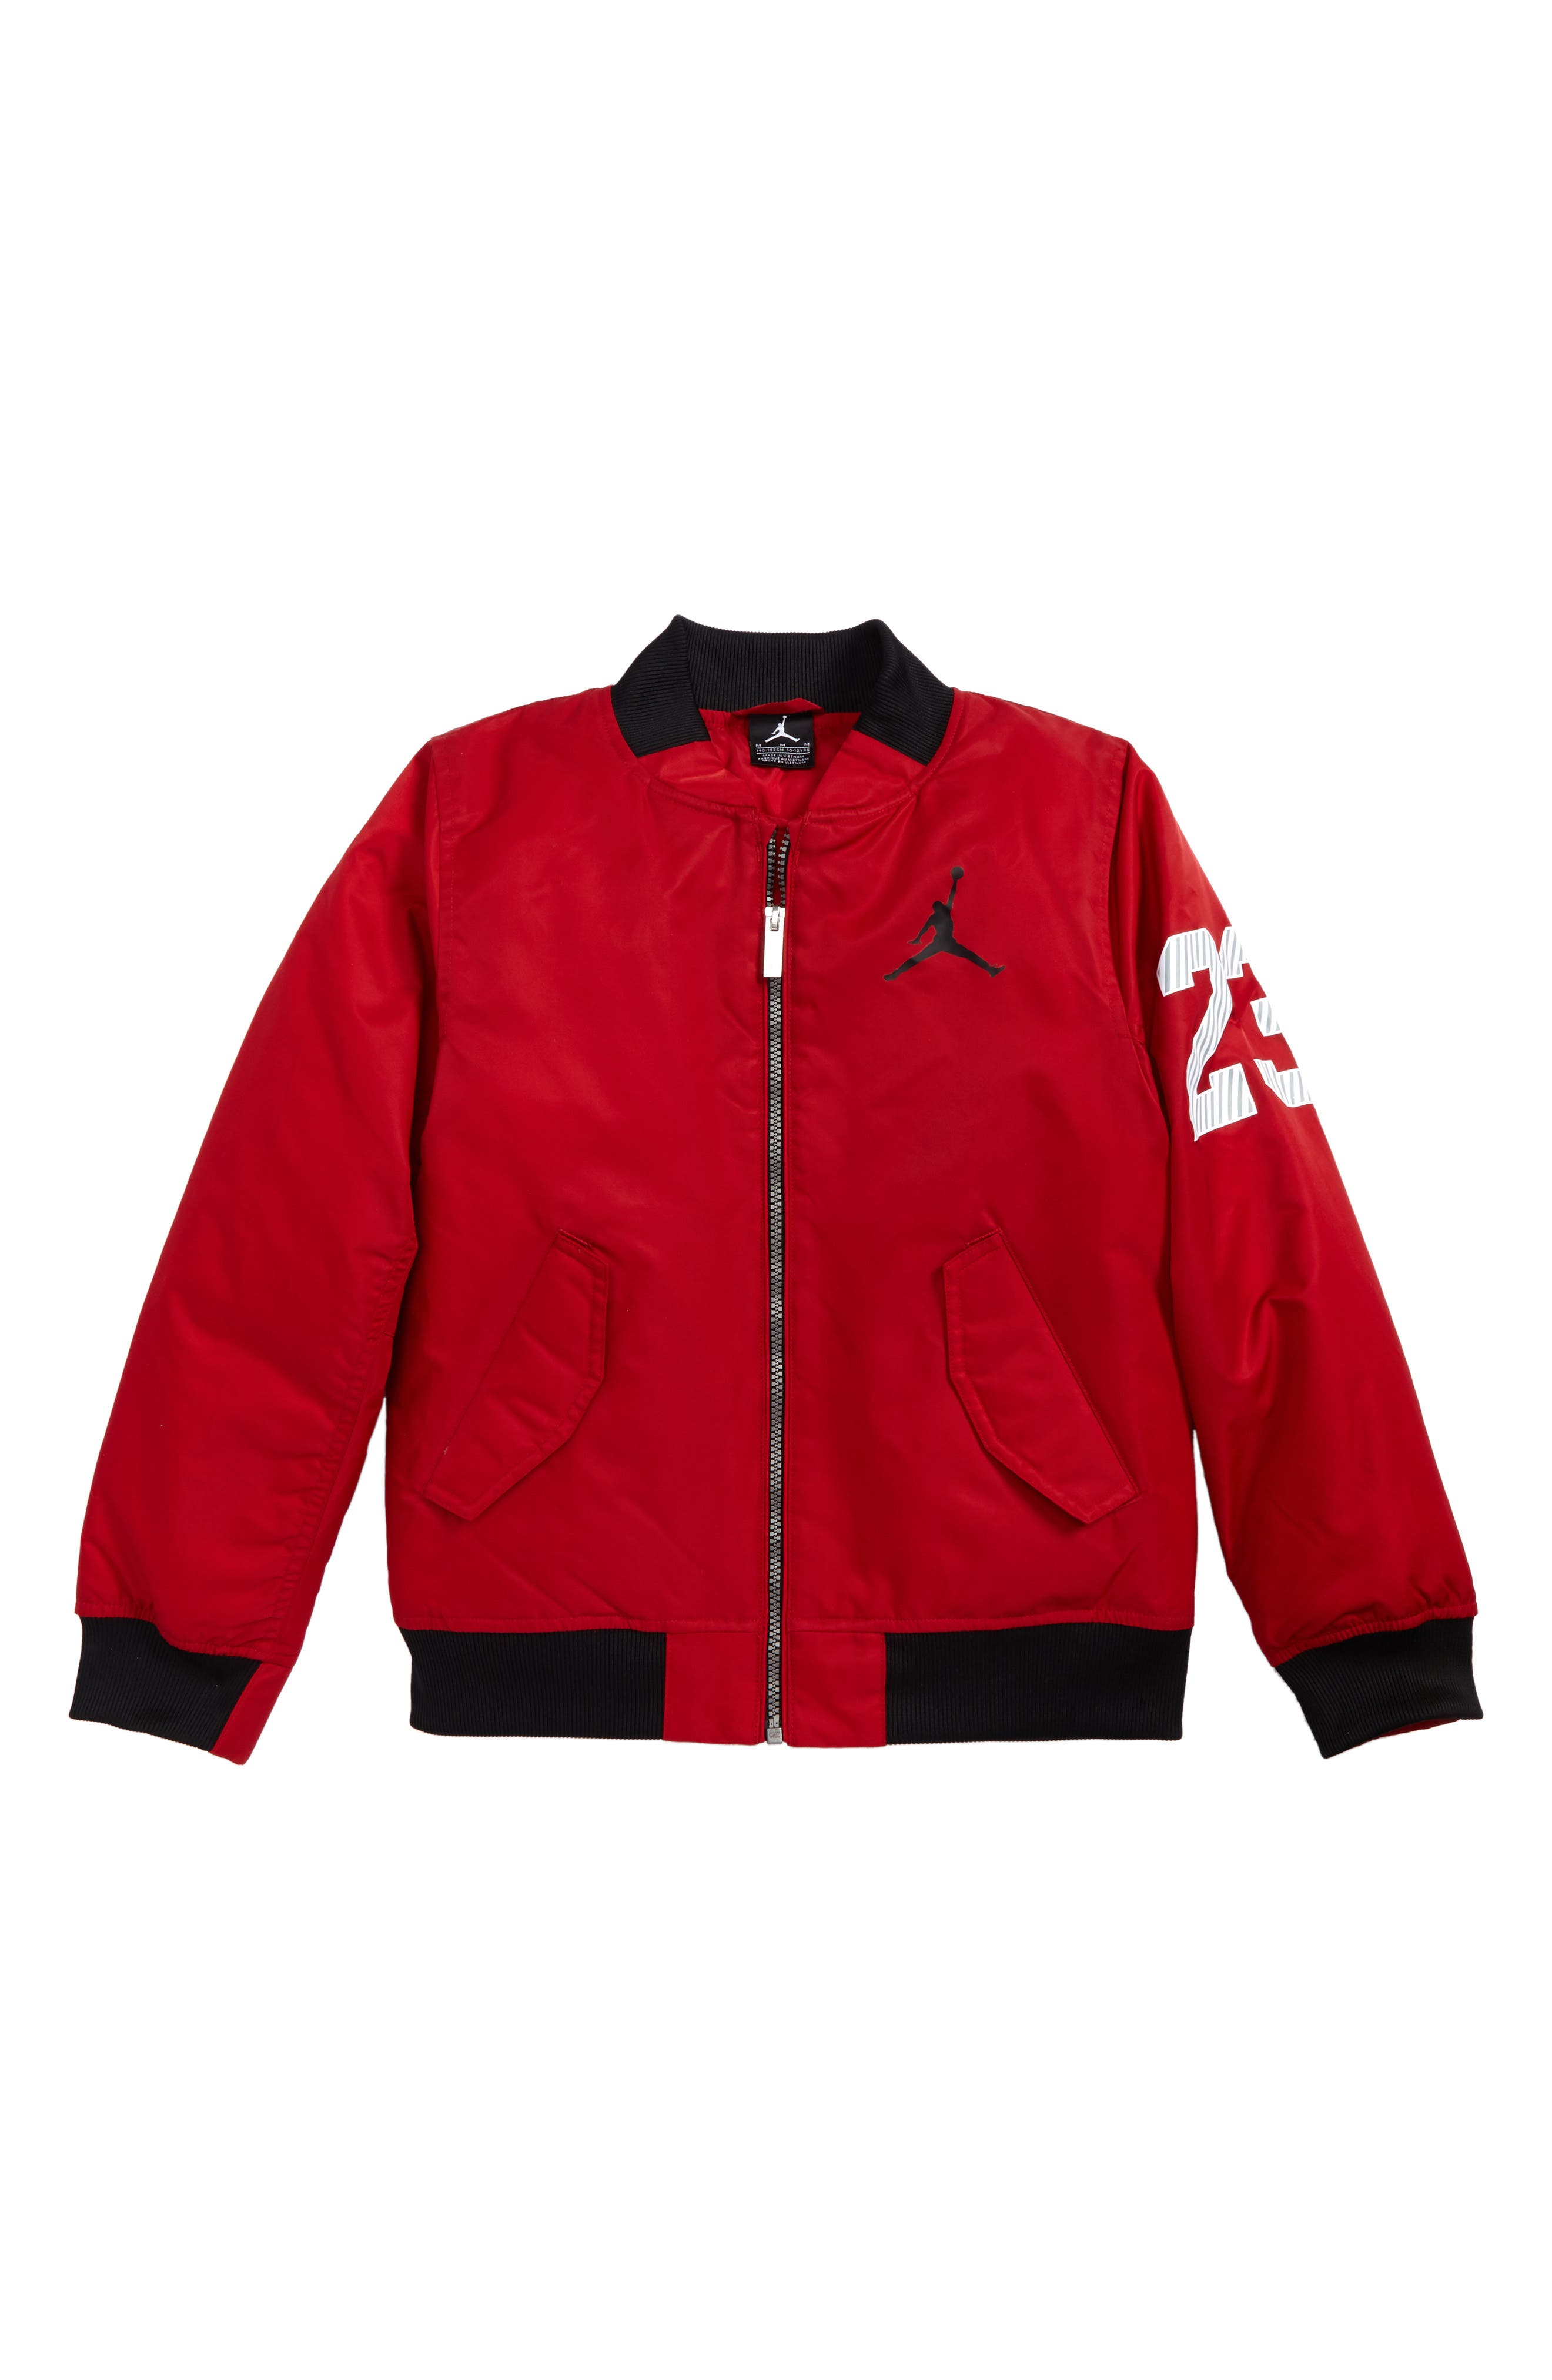 Jordan Fall in Line Jacket,                             Main thumbnail 1, color,                             Gym Red